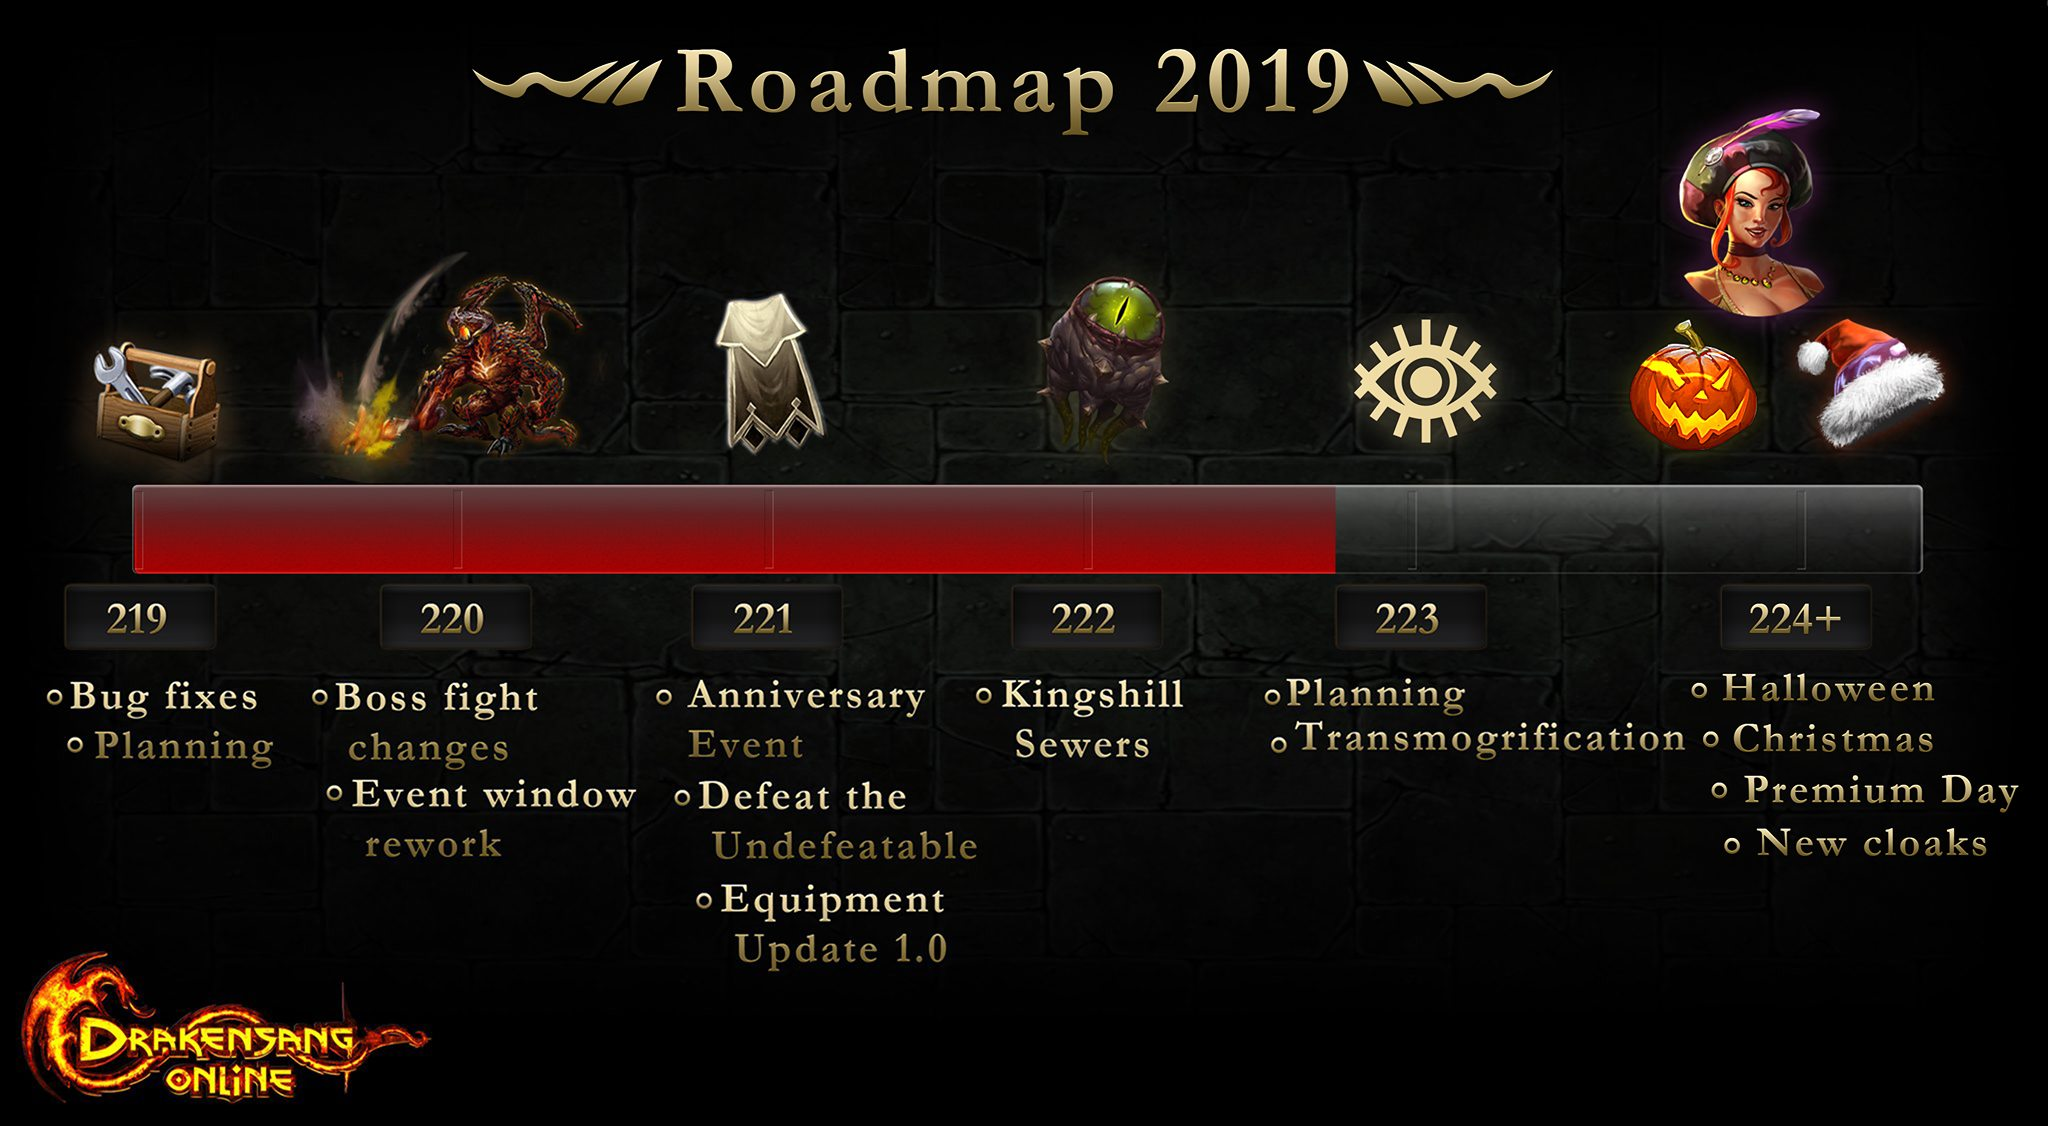 roadmap 2019 q4.jpg